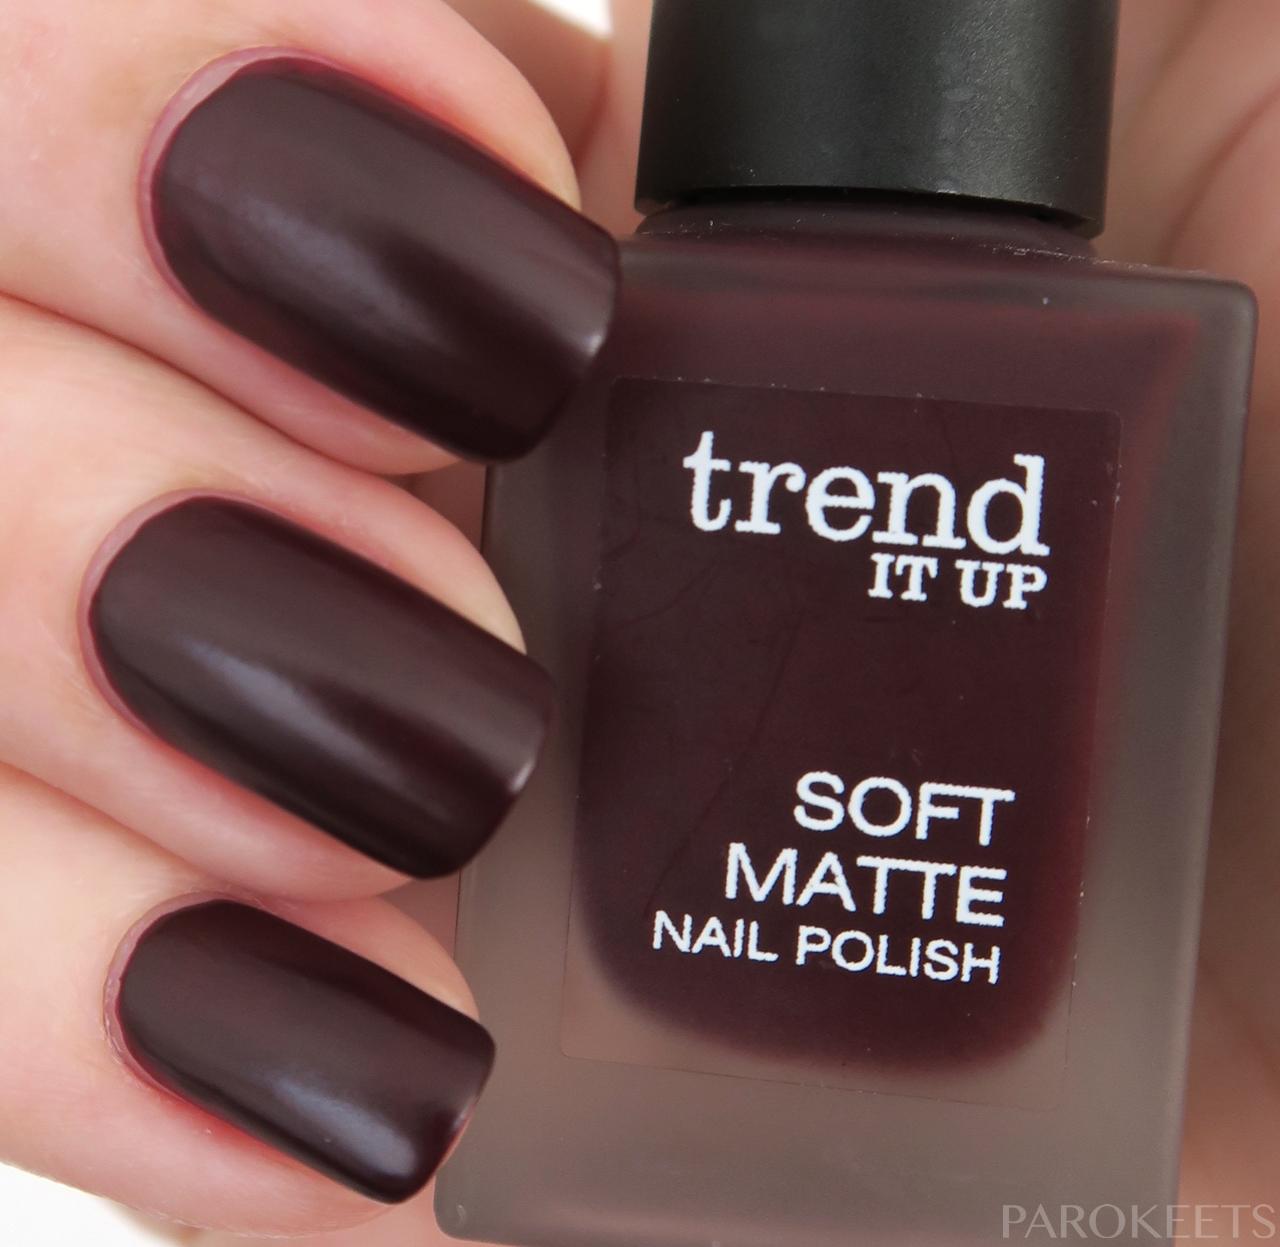 Trend It Up Soft Matte Nail Polishes Parokeets